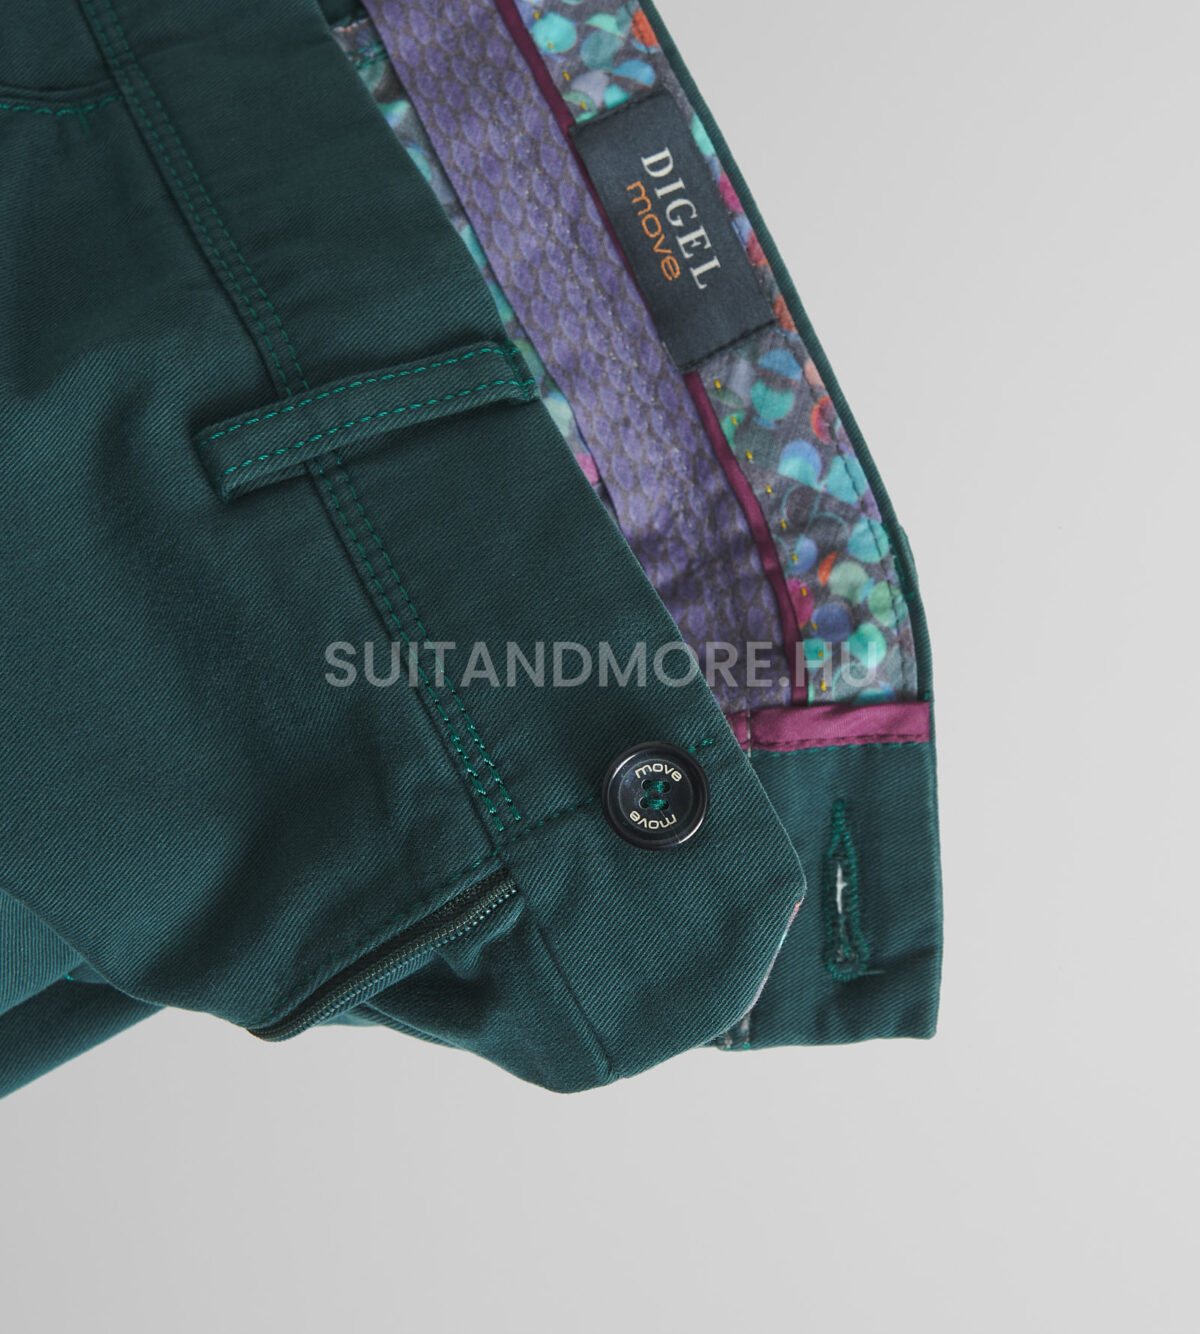 zöld-extra-slim-fit-pamut-sztreccs-chino-nadrág-NIGEL-88160-51-04